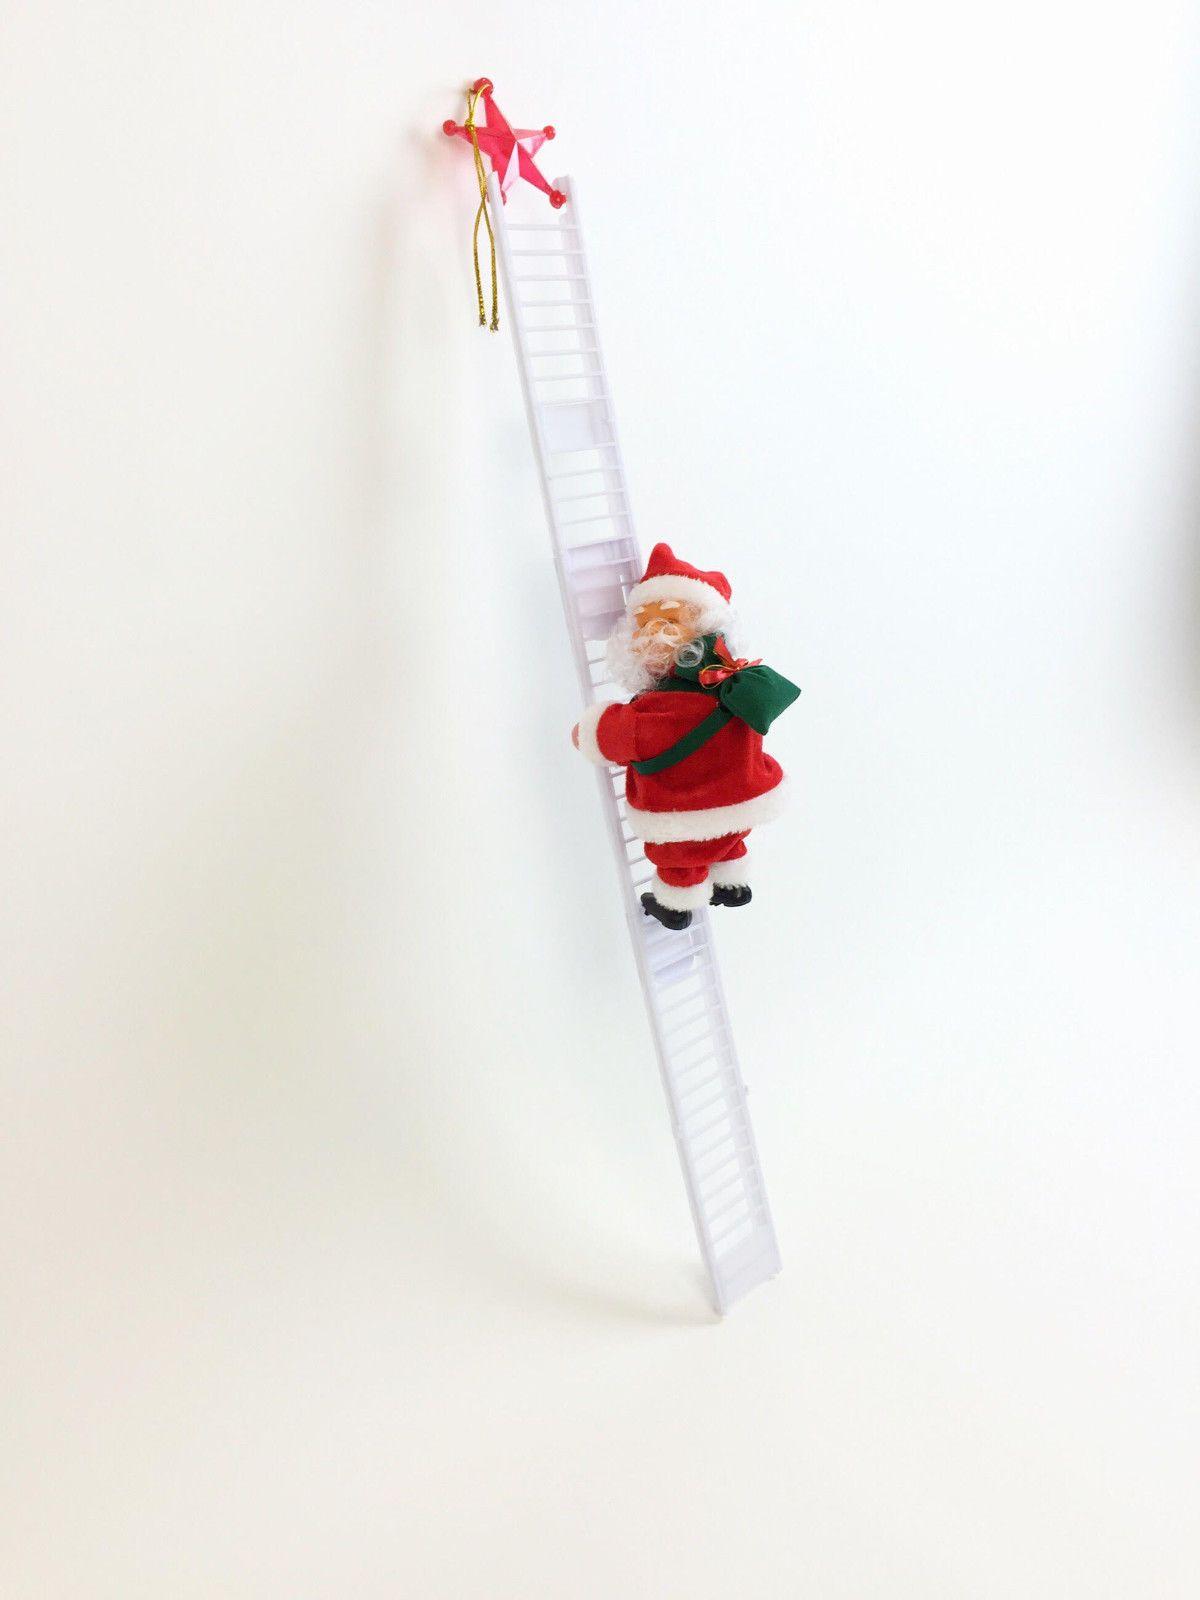 Pin by Zeppy on santa claus Pinterest